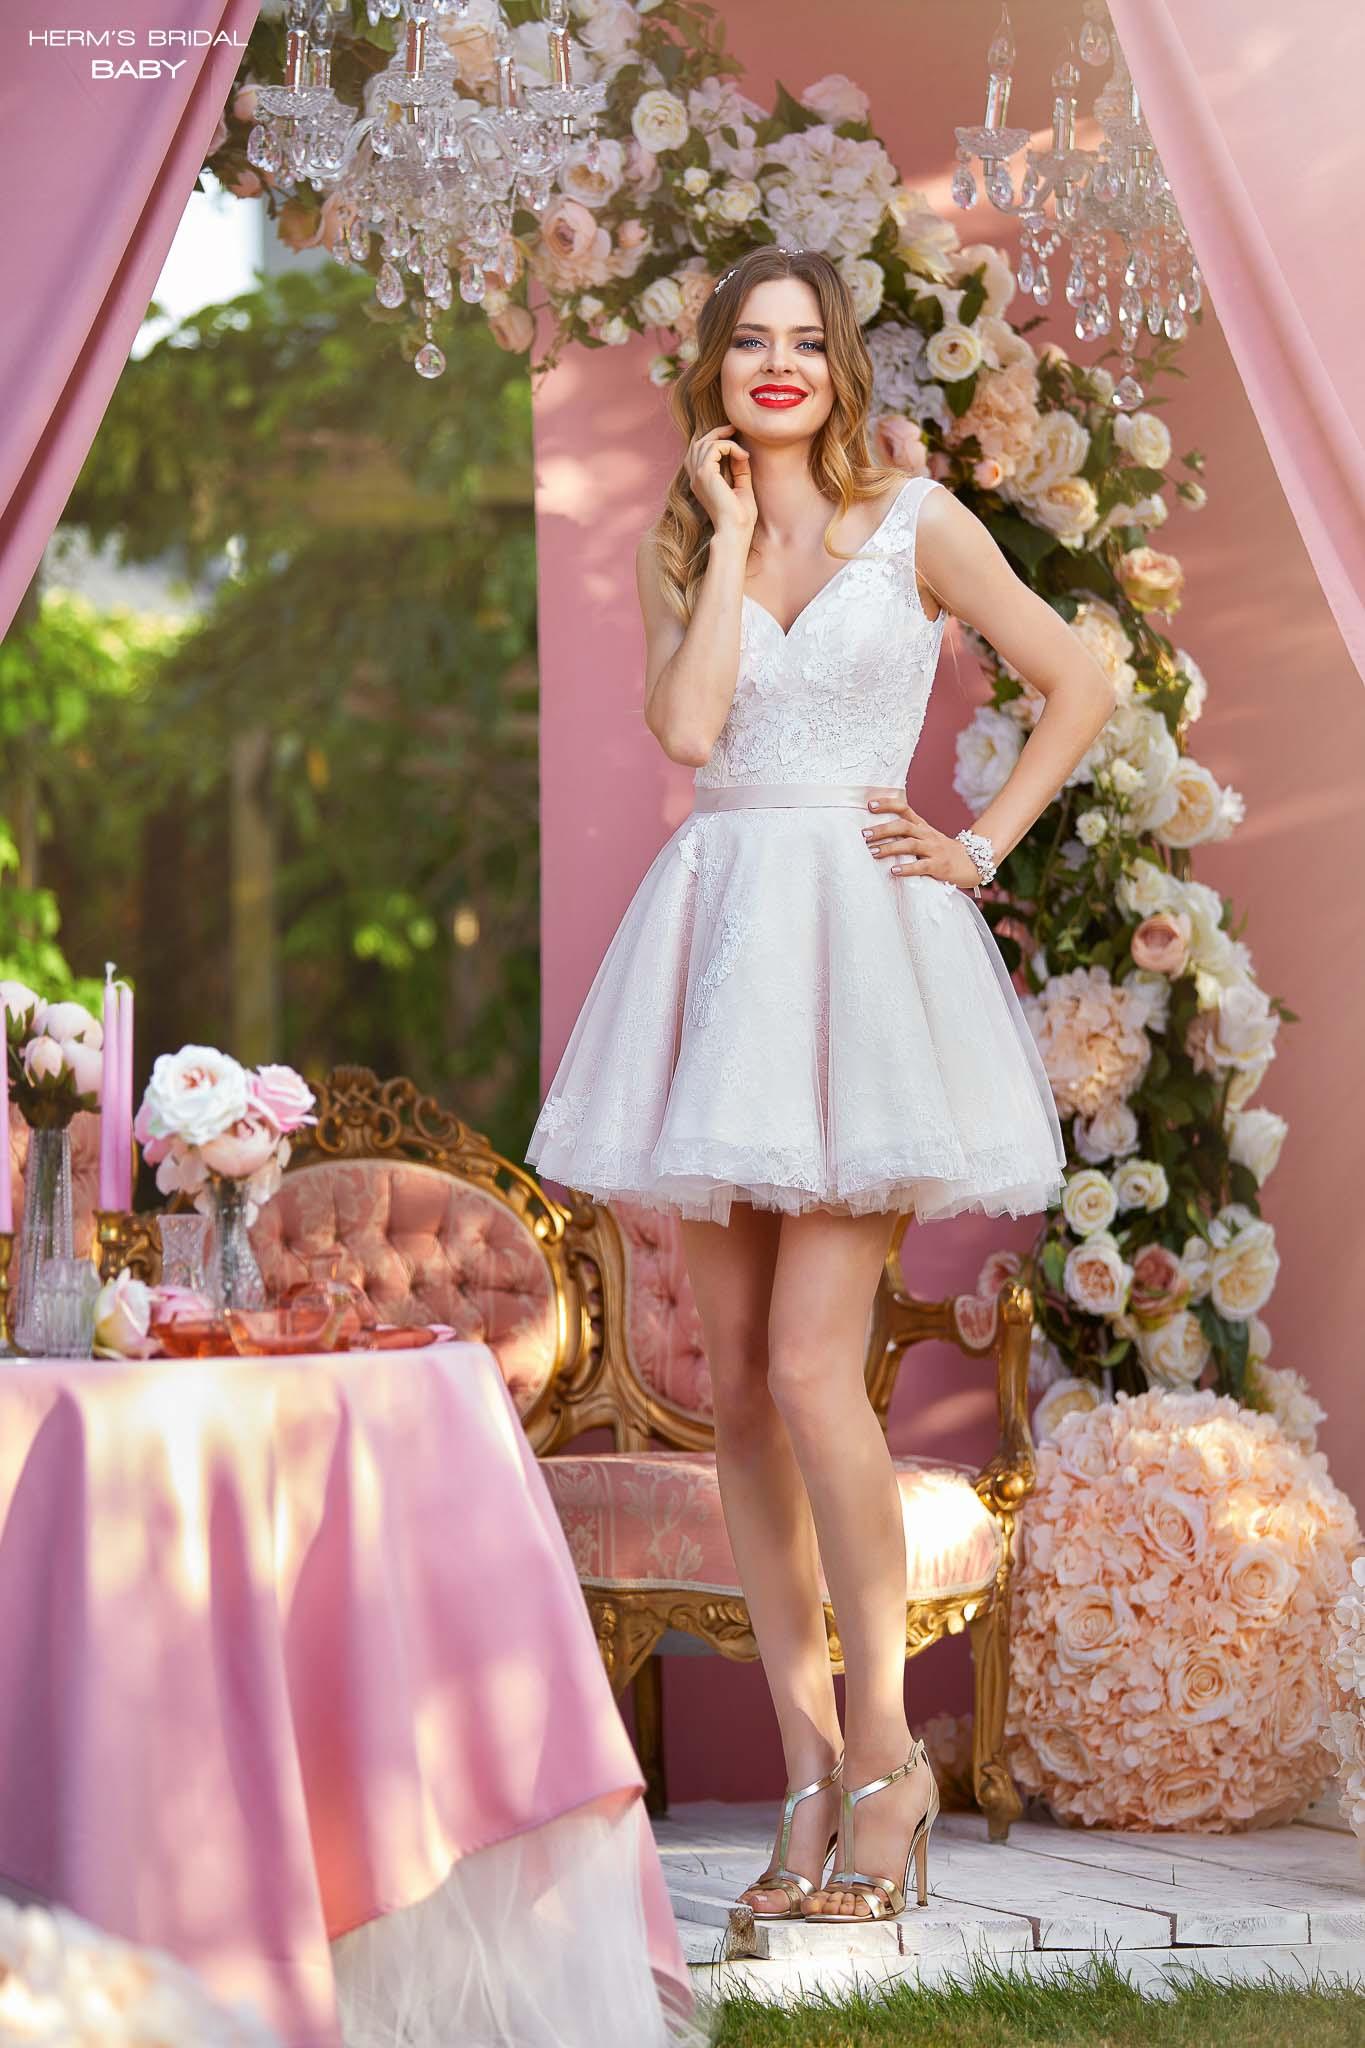 suknia ślubna Herm's Bridal Baby